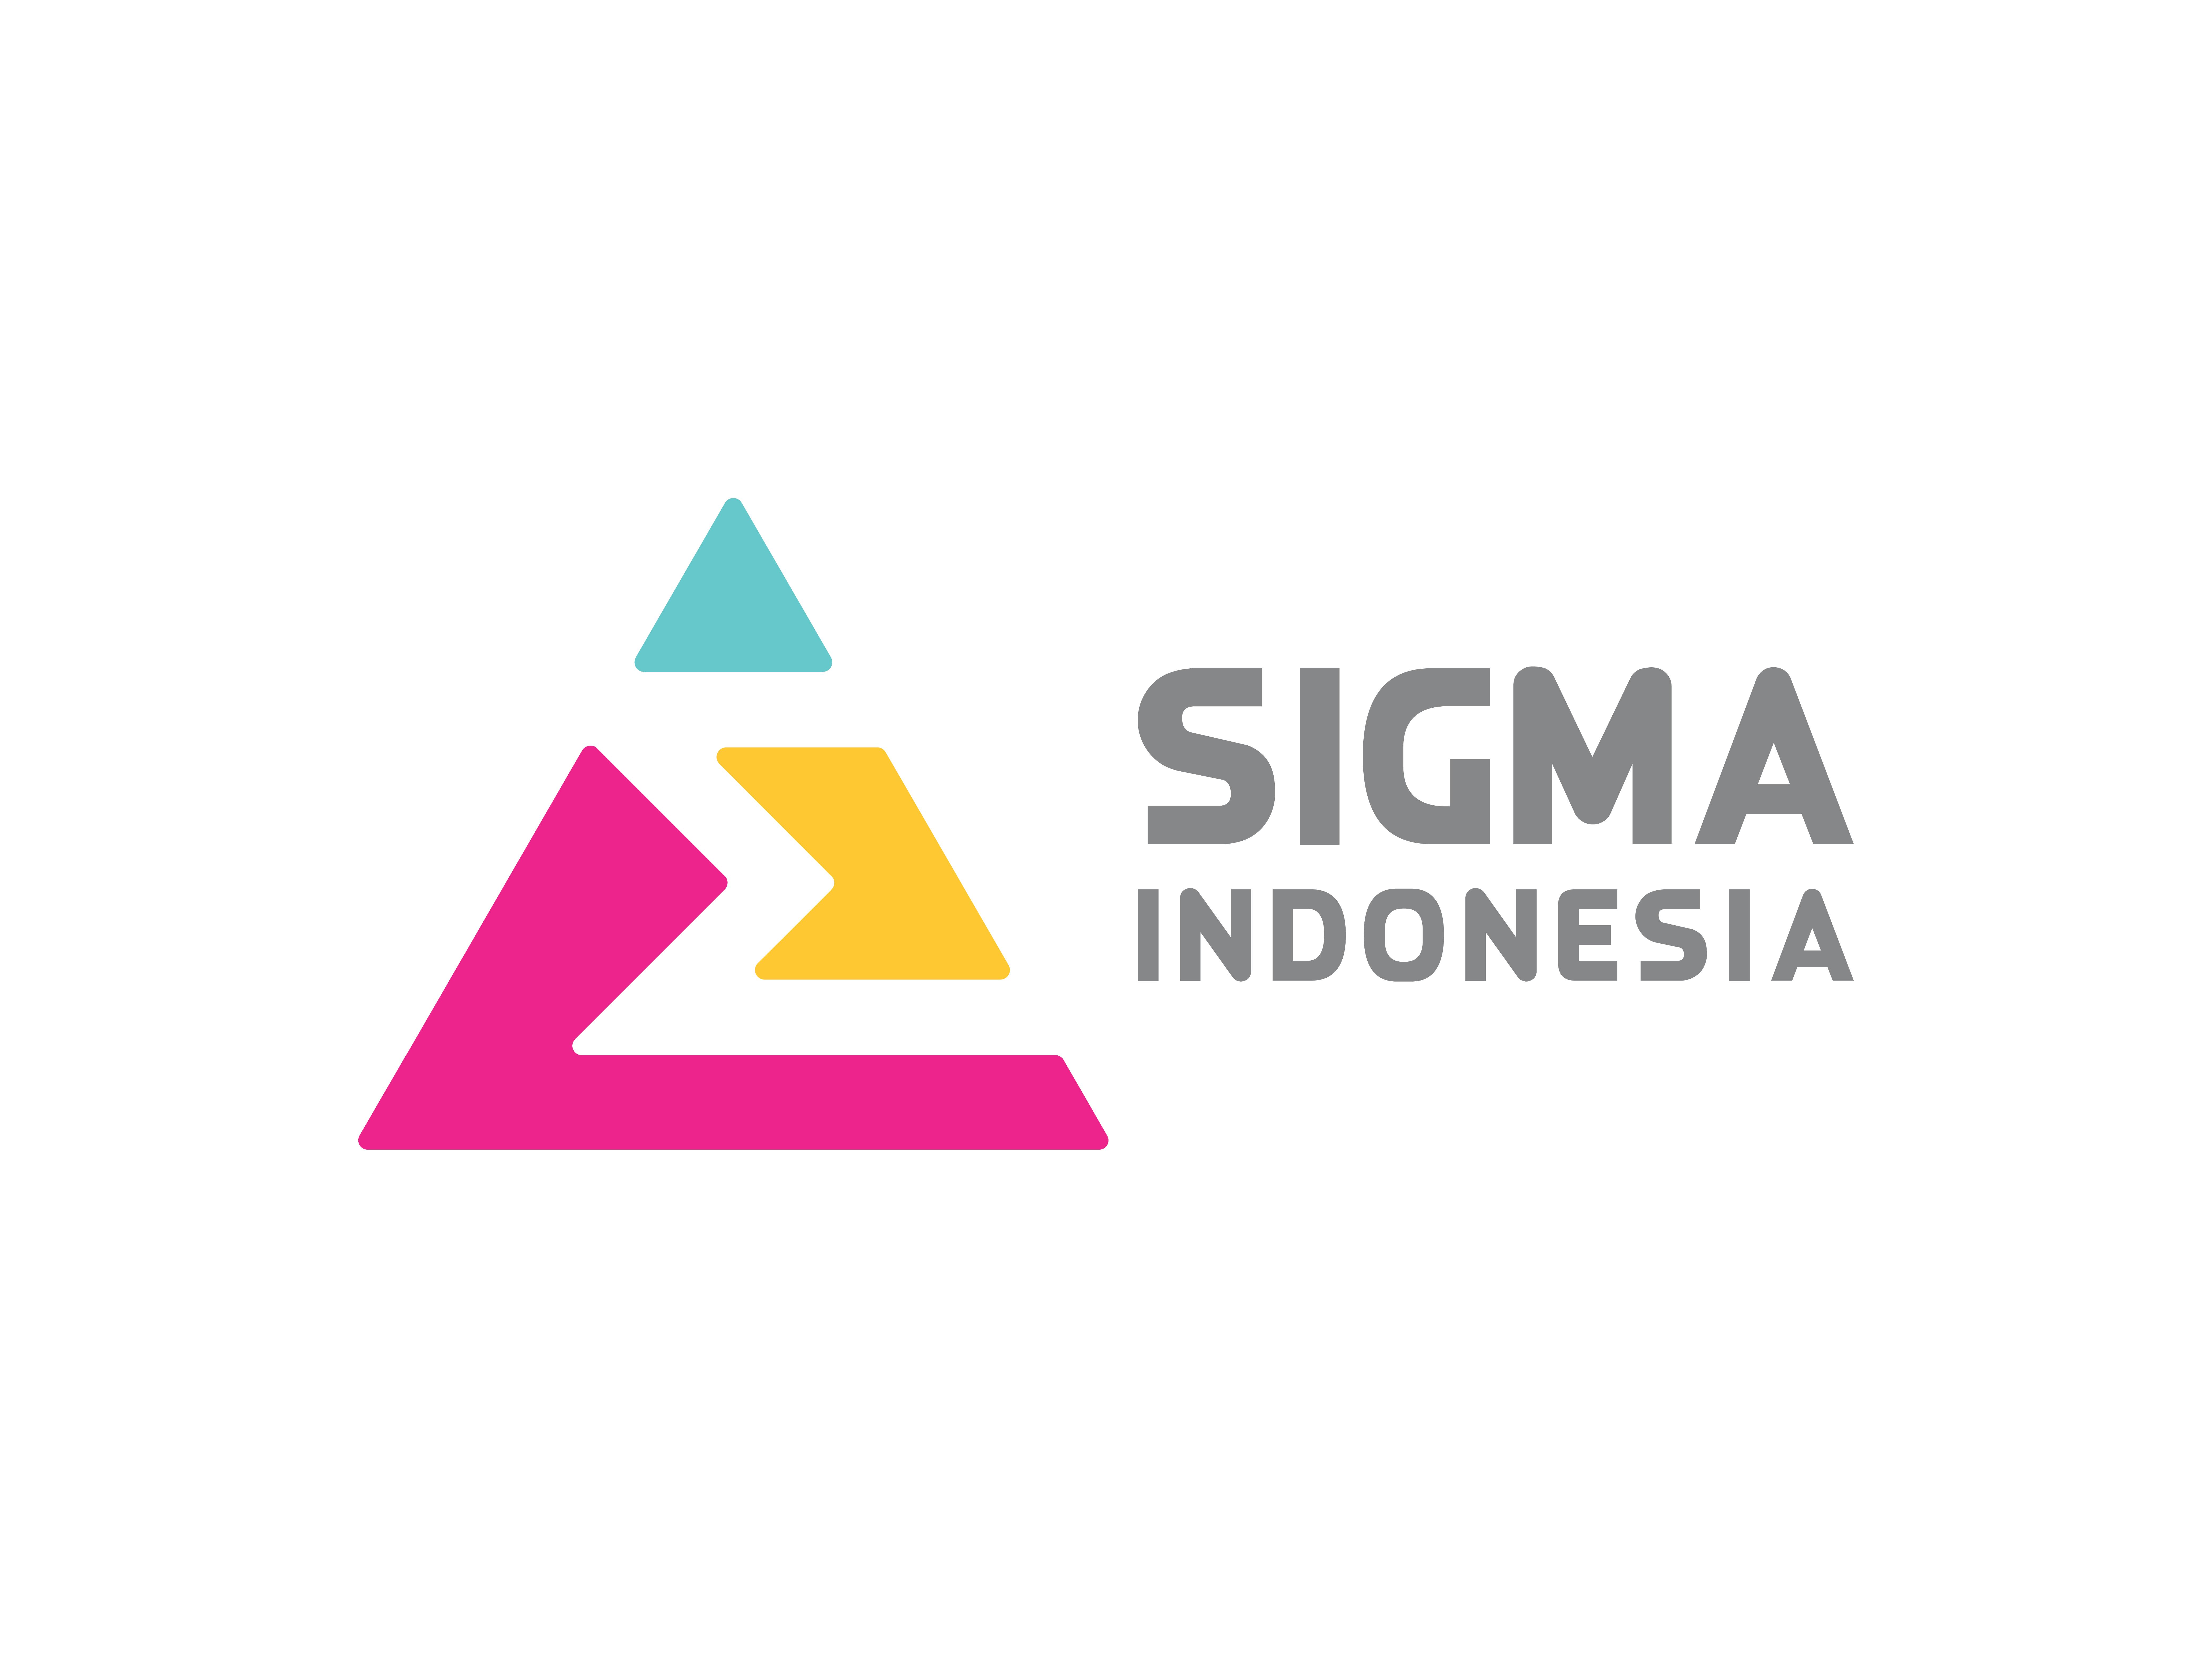 SIGMA INDONESIA